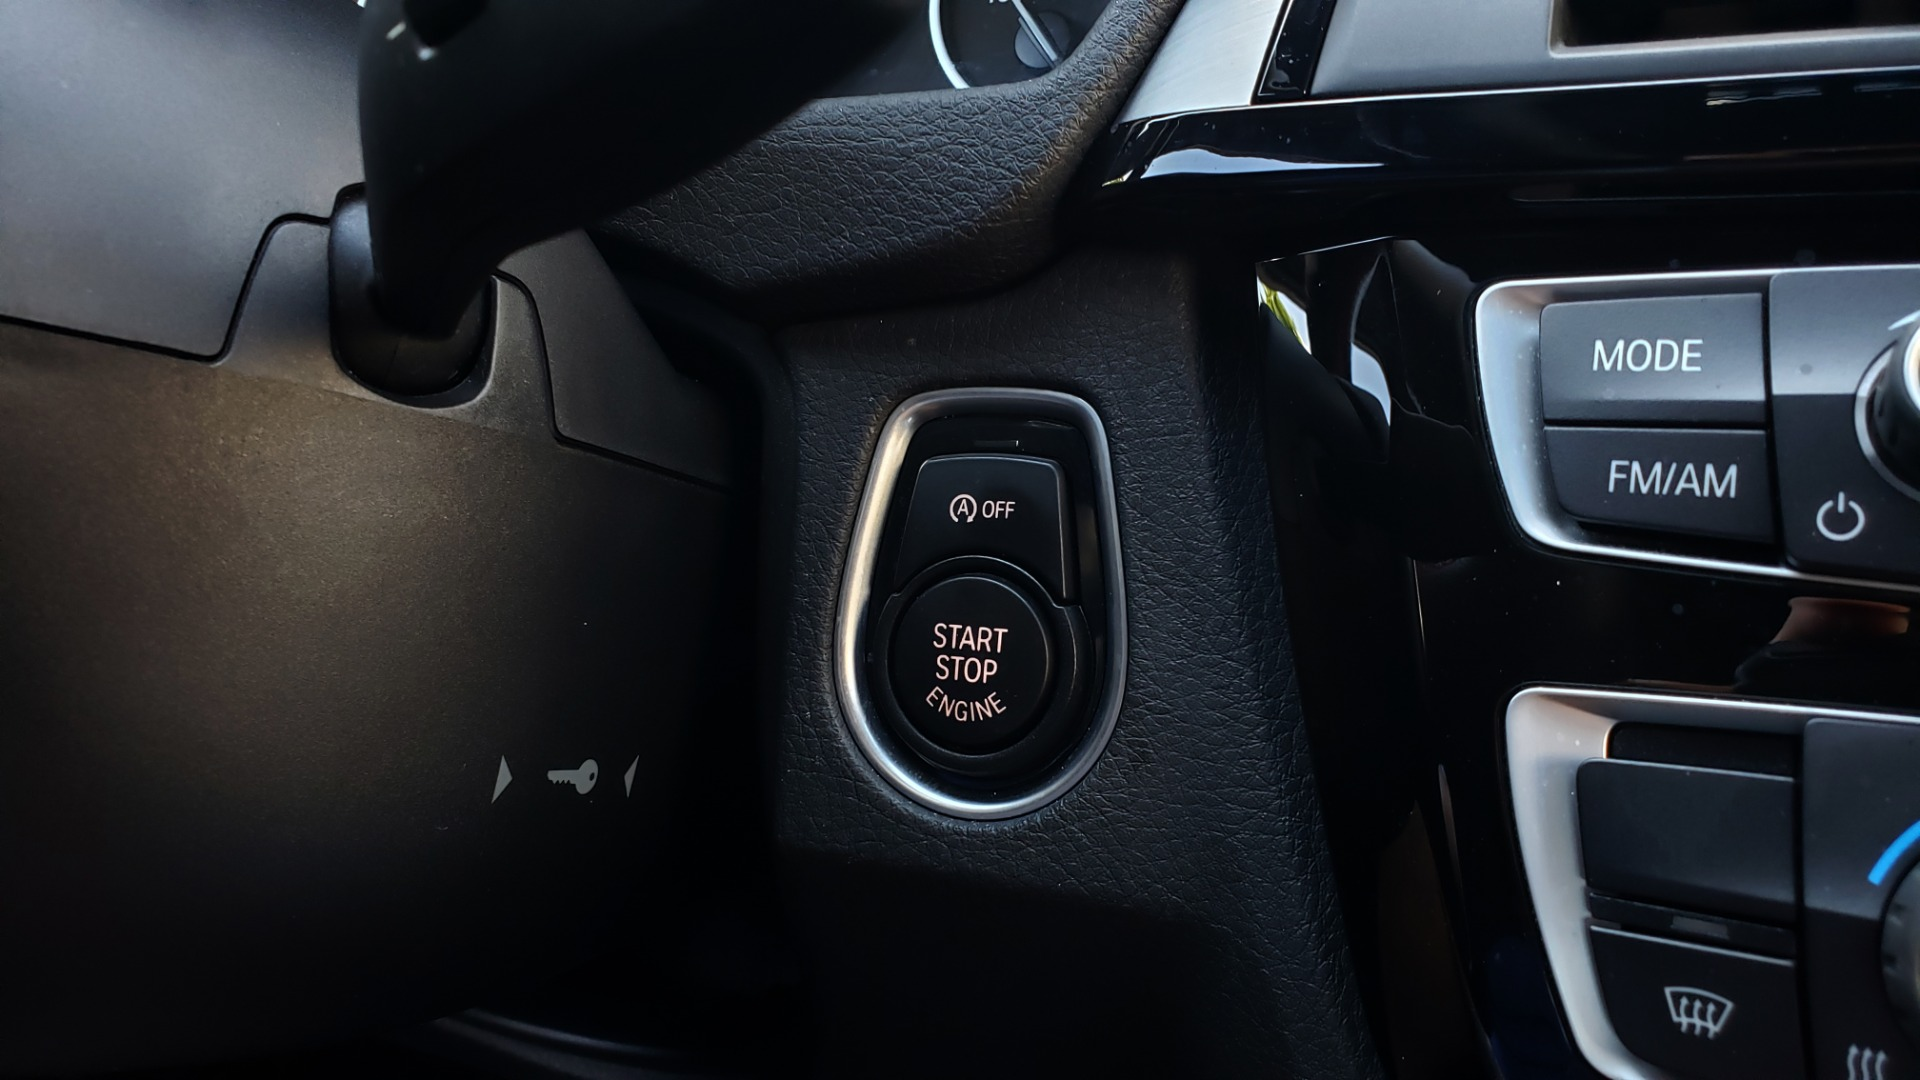 Used 2017 BMW 3 SERIES 330I SPORT SEDAN / DRVR ASST PKG / SUNROOF / REARVIEW for sale Sold at Formula Imports in Charlotte NC 28227 41